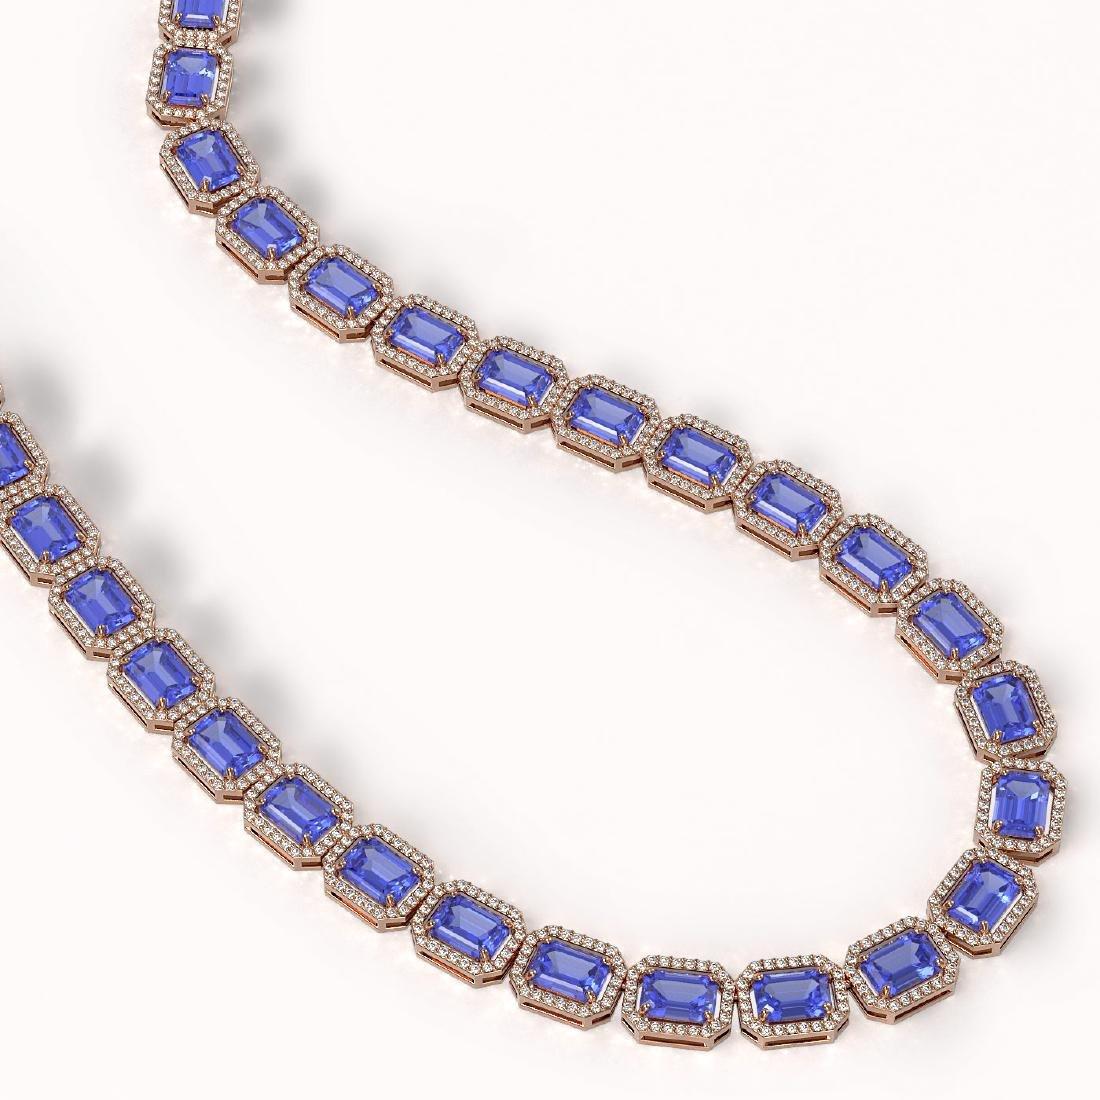 56.69 CTW Tanzanite & Diamond Halo Necklace 10K Rose - 2